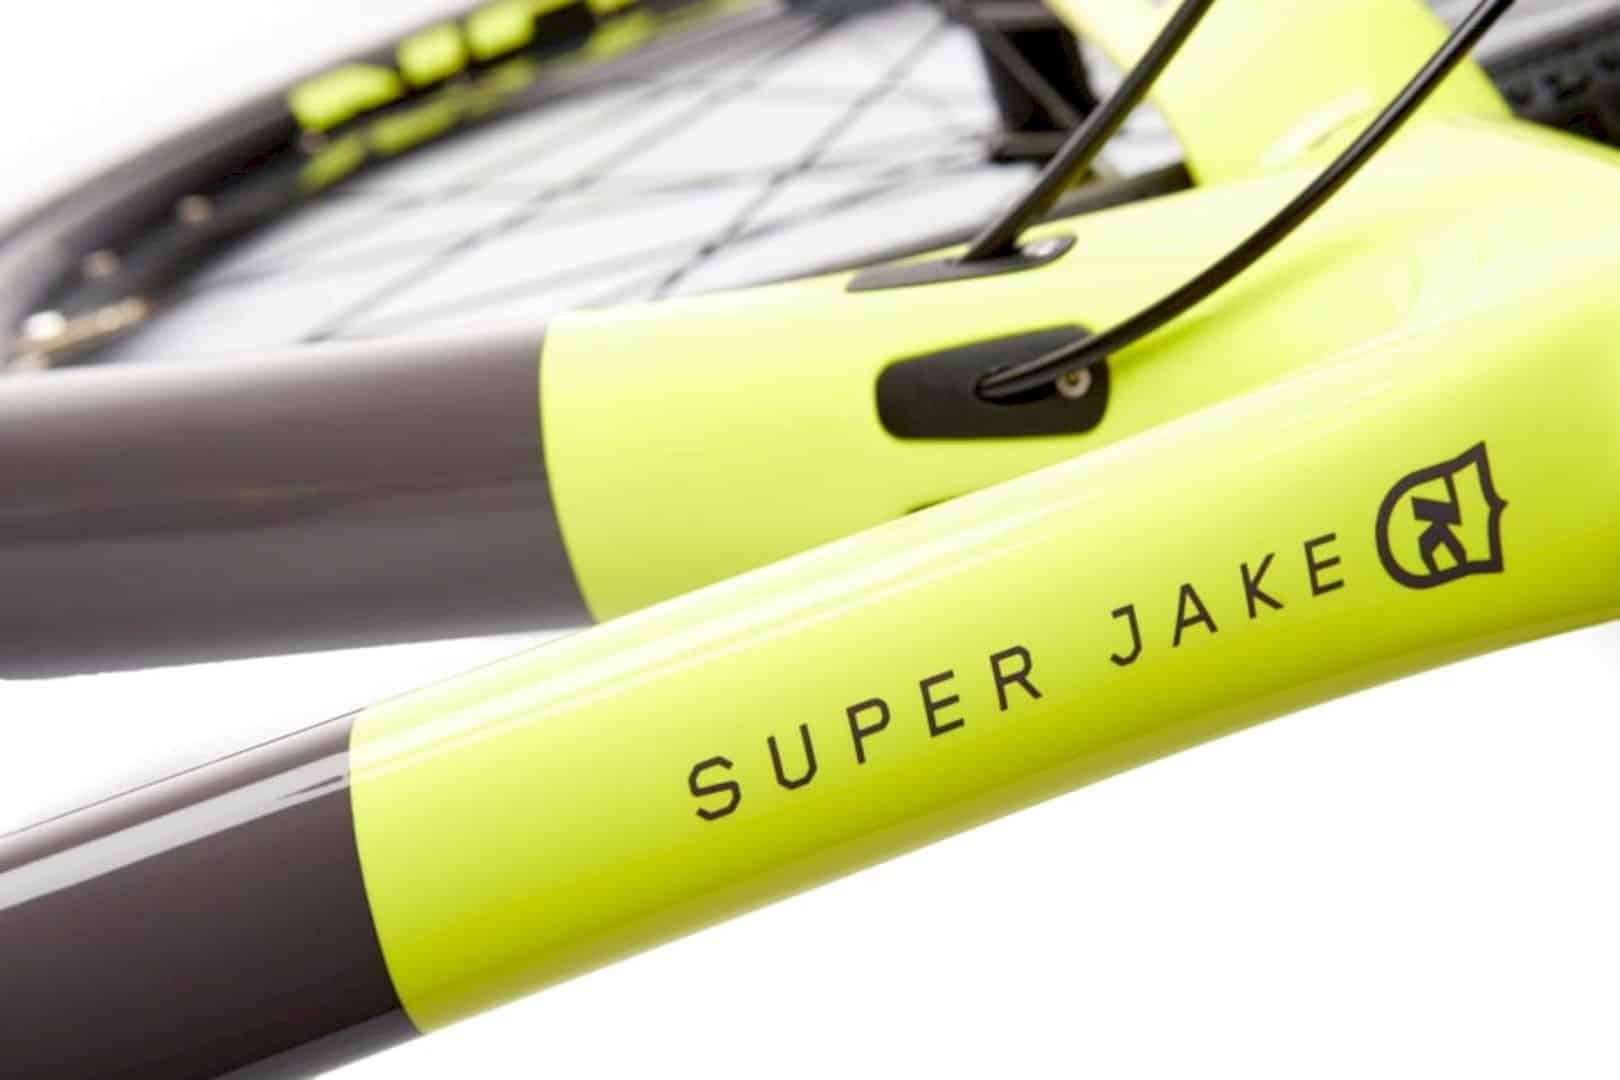 Super Jake 11